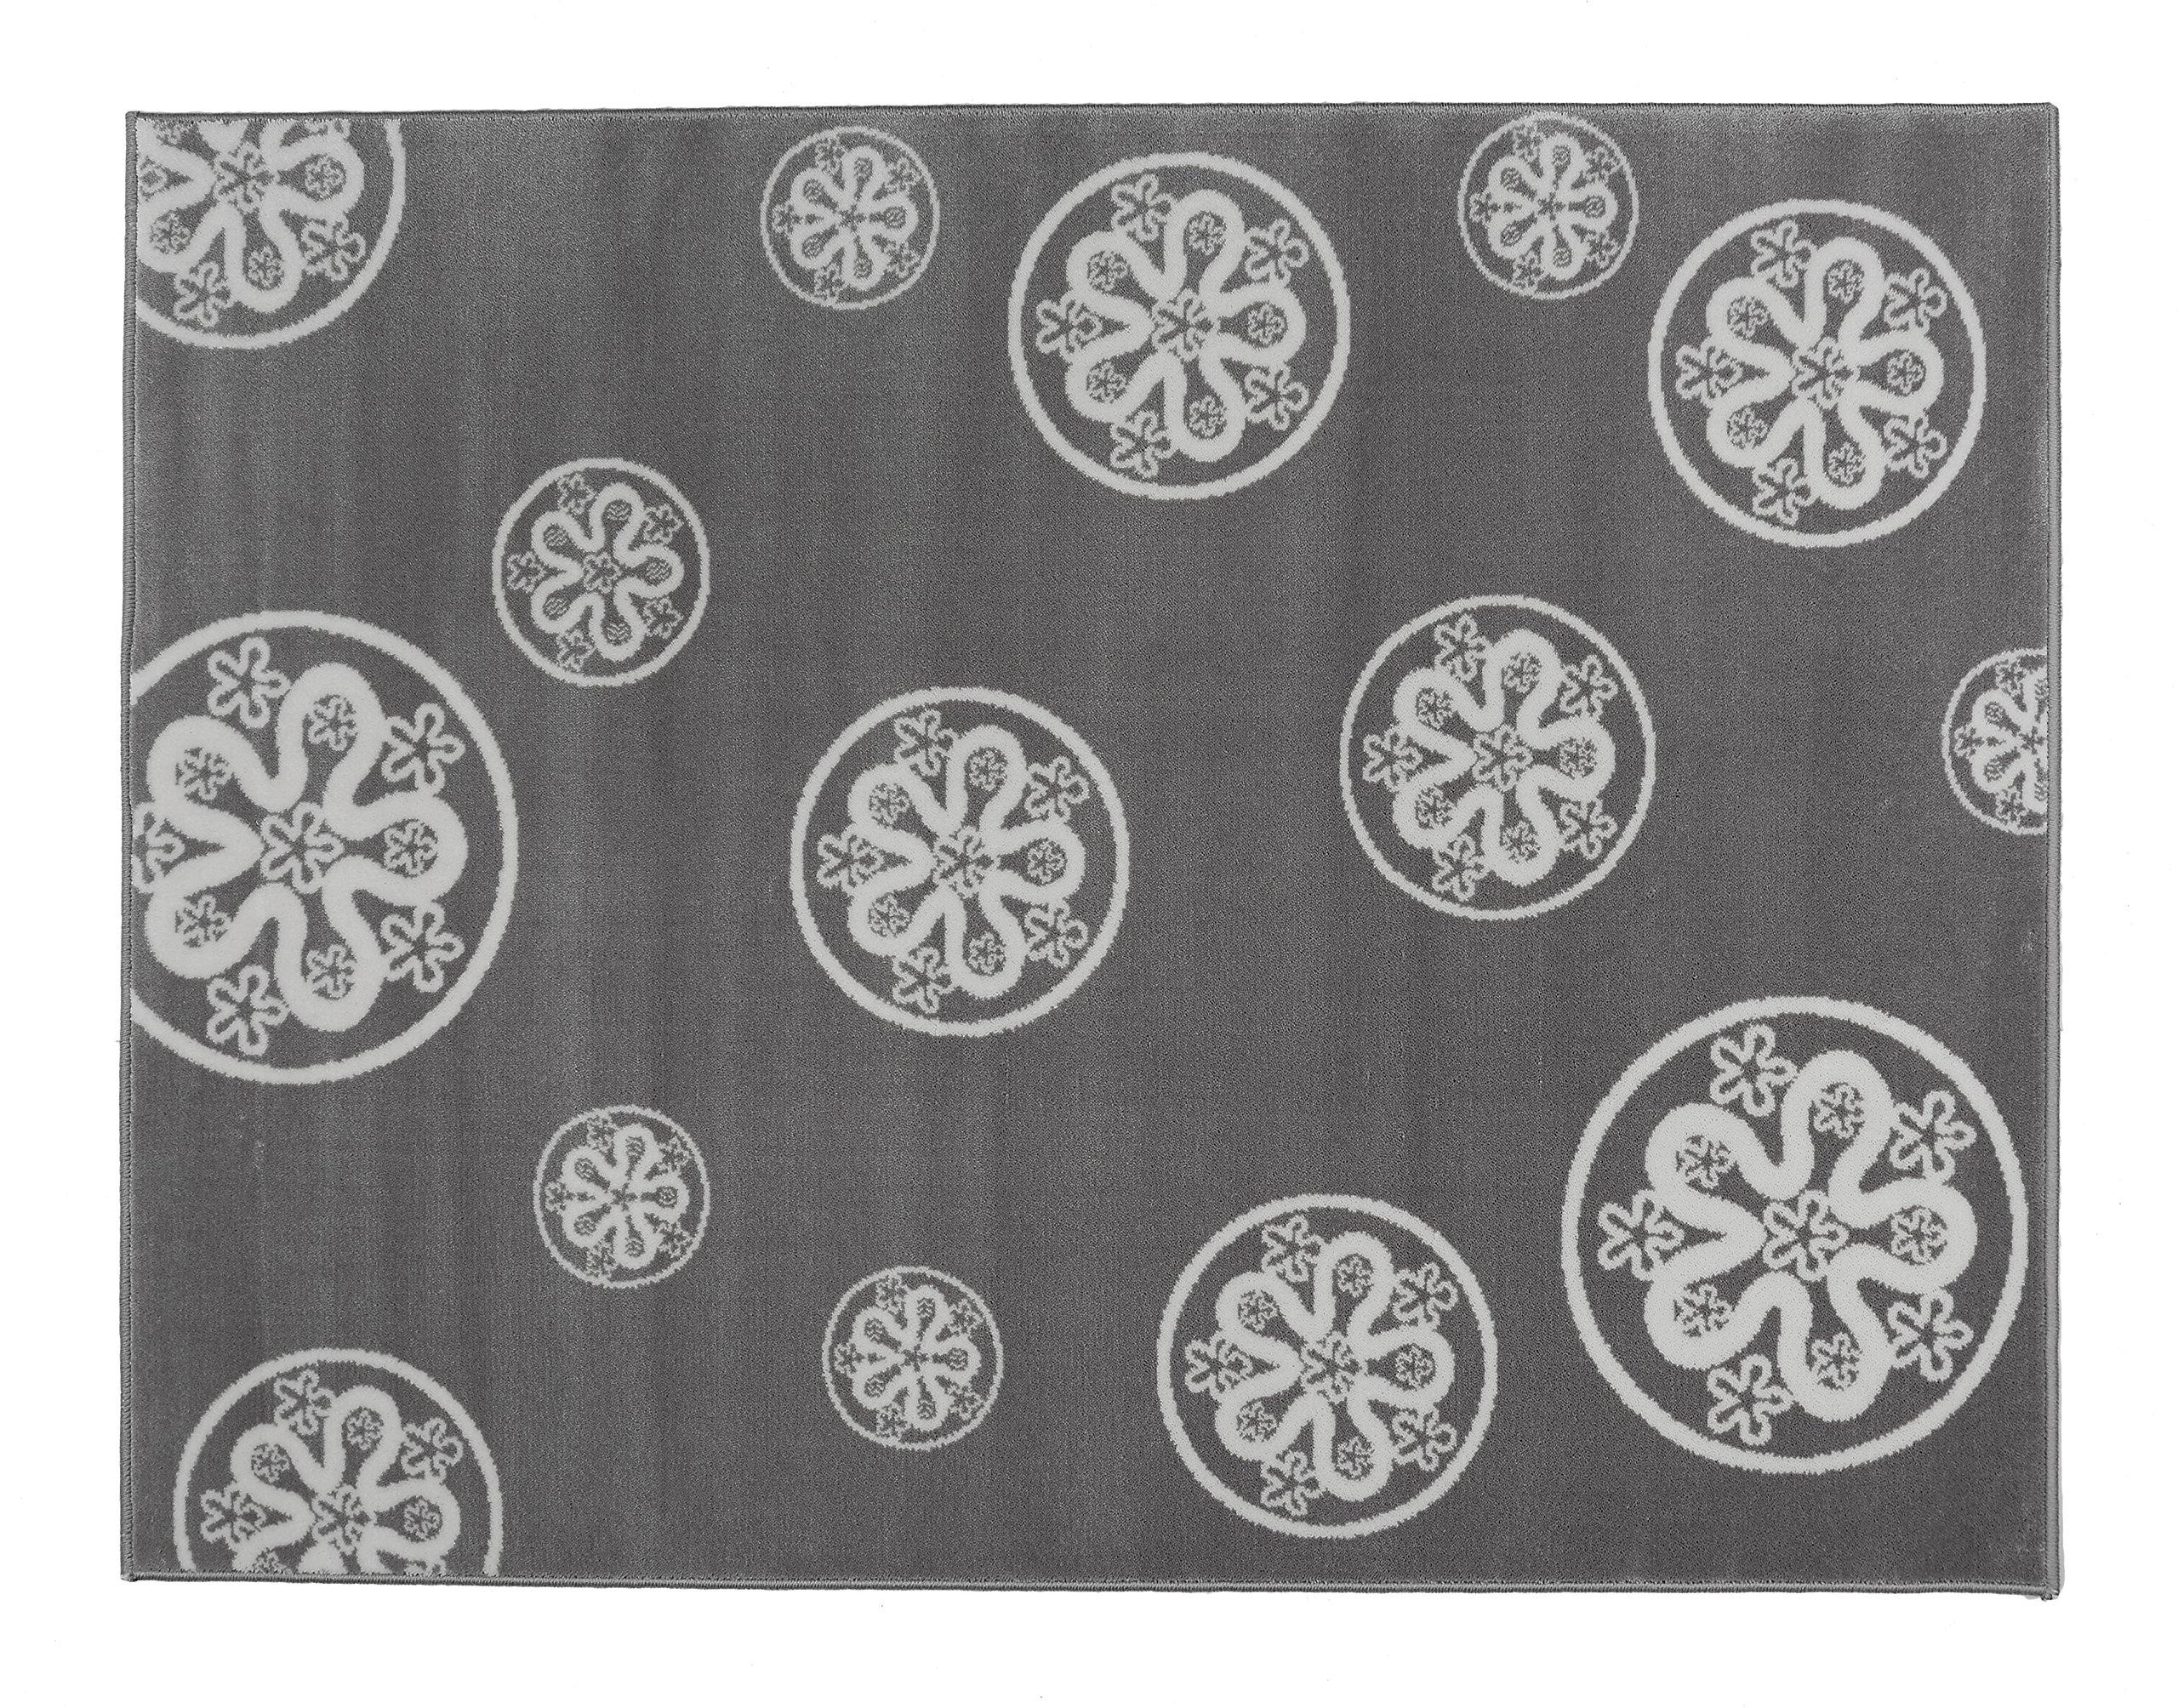 Aratextil. Bambini Tappeto 100% Acrilico. Coleccion Flores Gris 140x200 cms